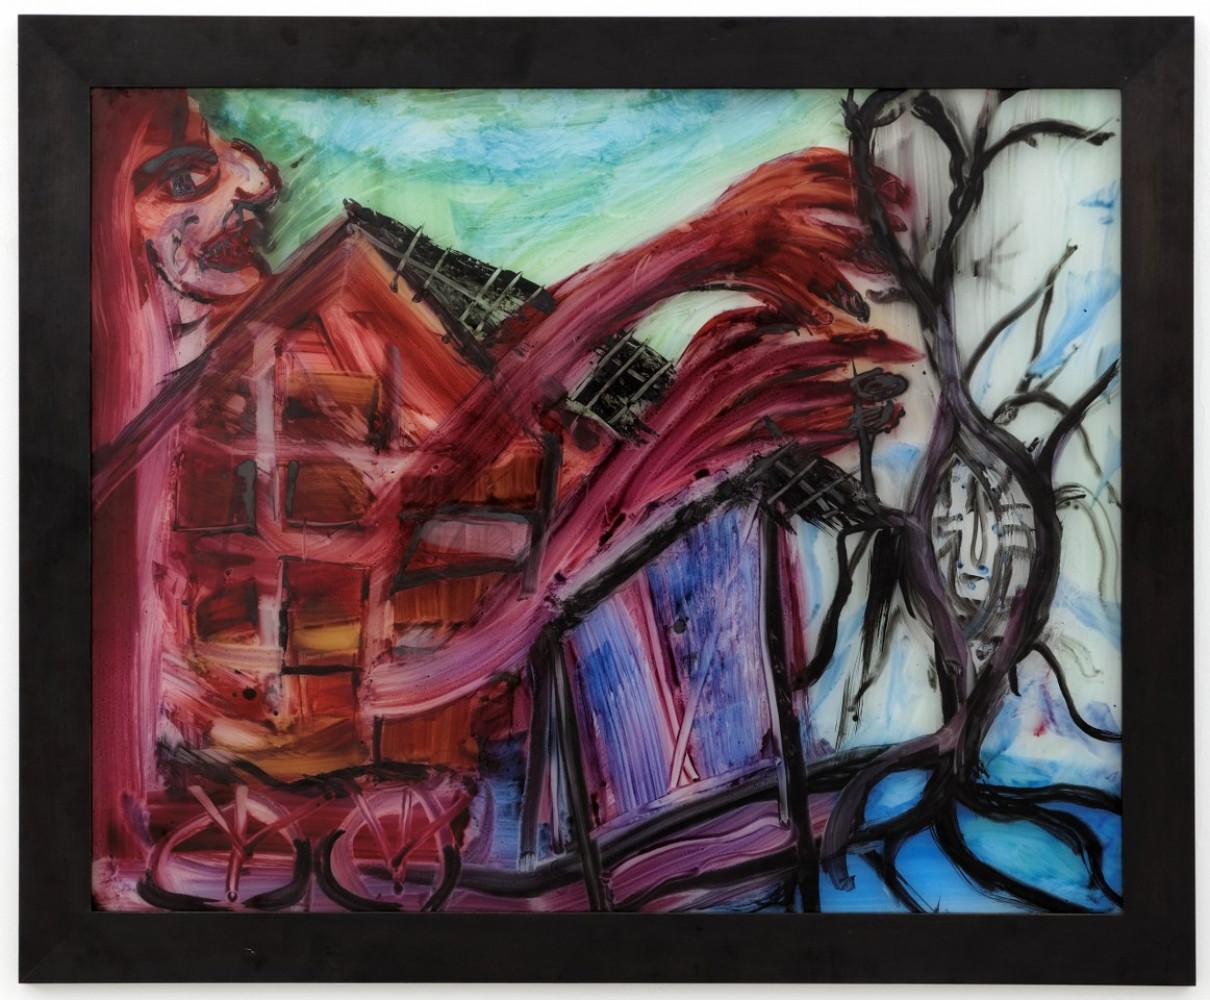 Martin Disler, 'Ohne Titel', 1994